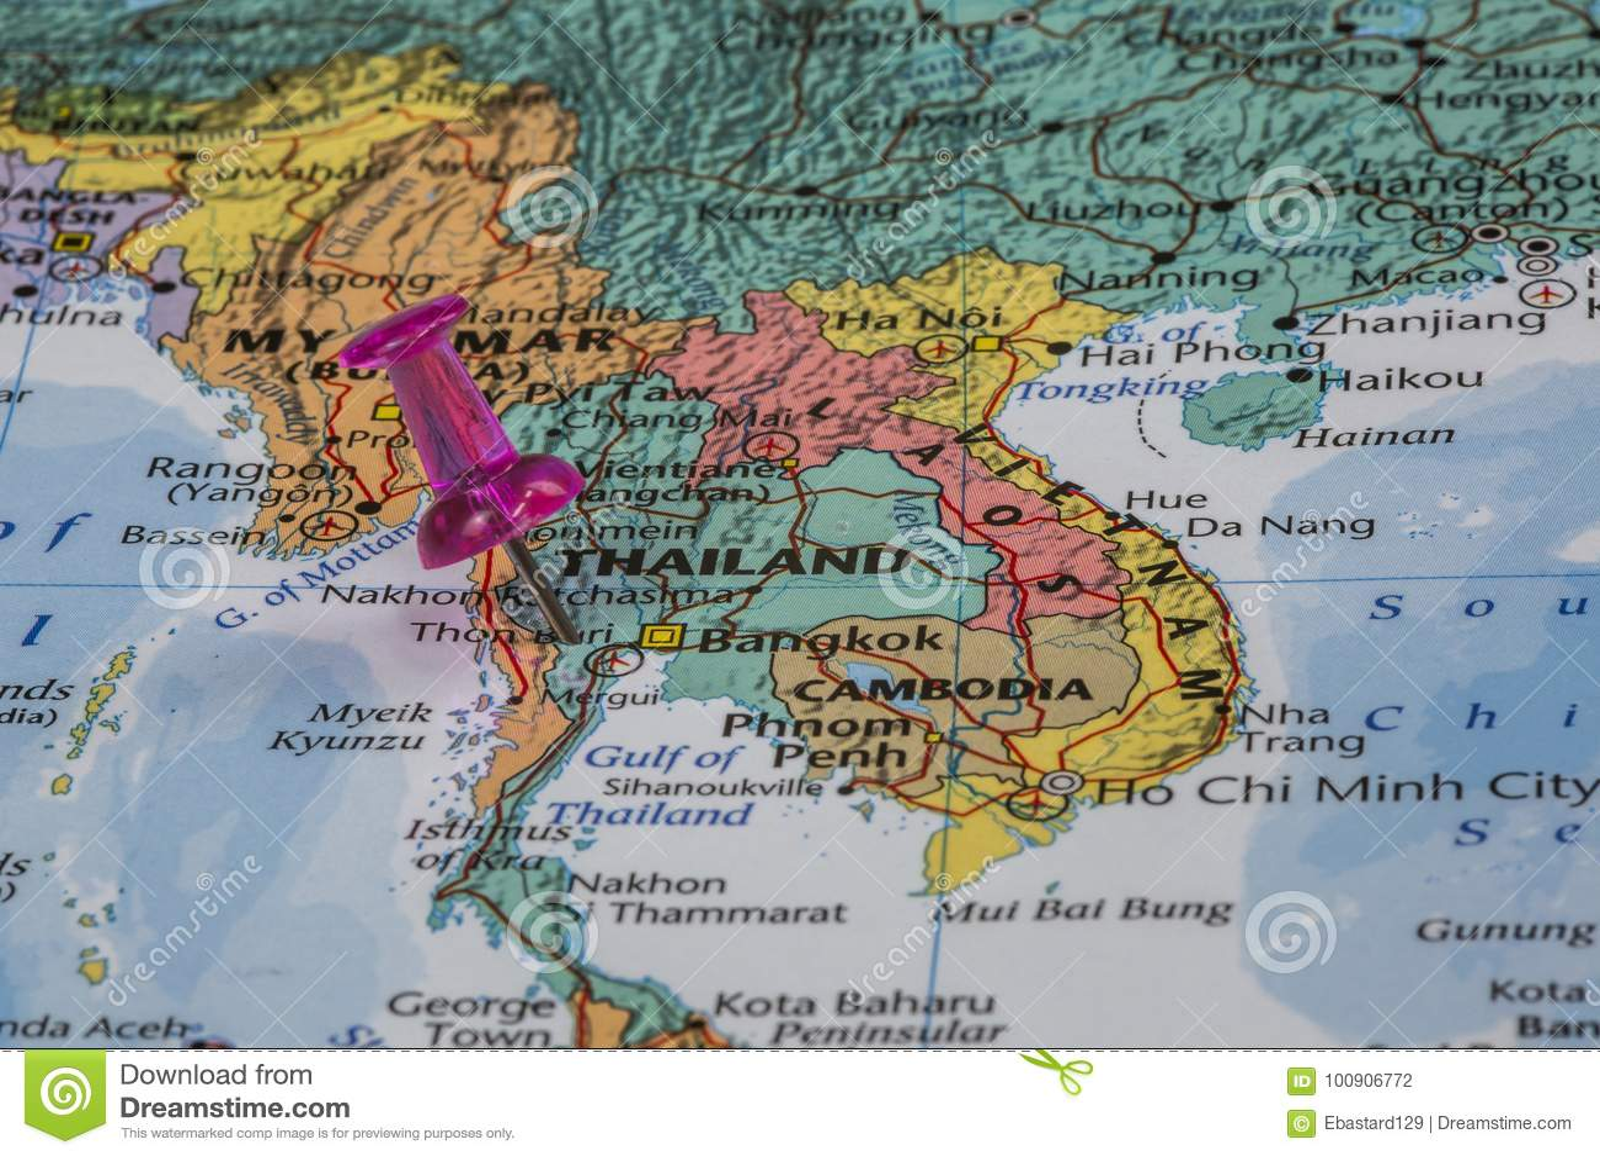 Map of taiwan stock photo image of europe atlas navigation download map of taiwan stock photo image of europe atlas navigation 100906772 gumiabroncs Choice Image